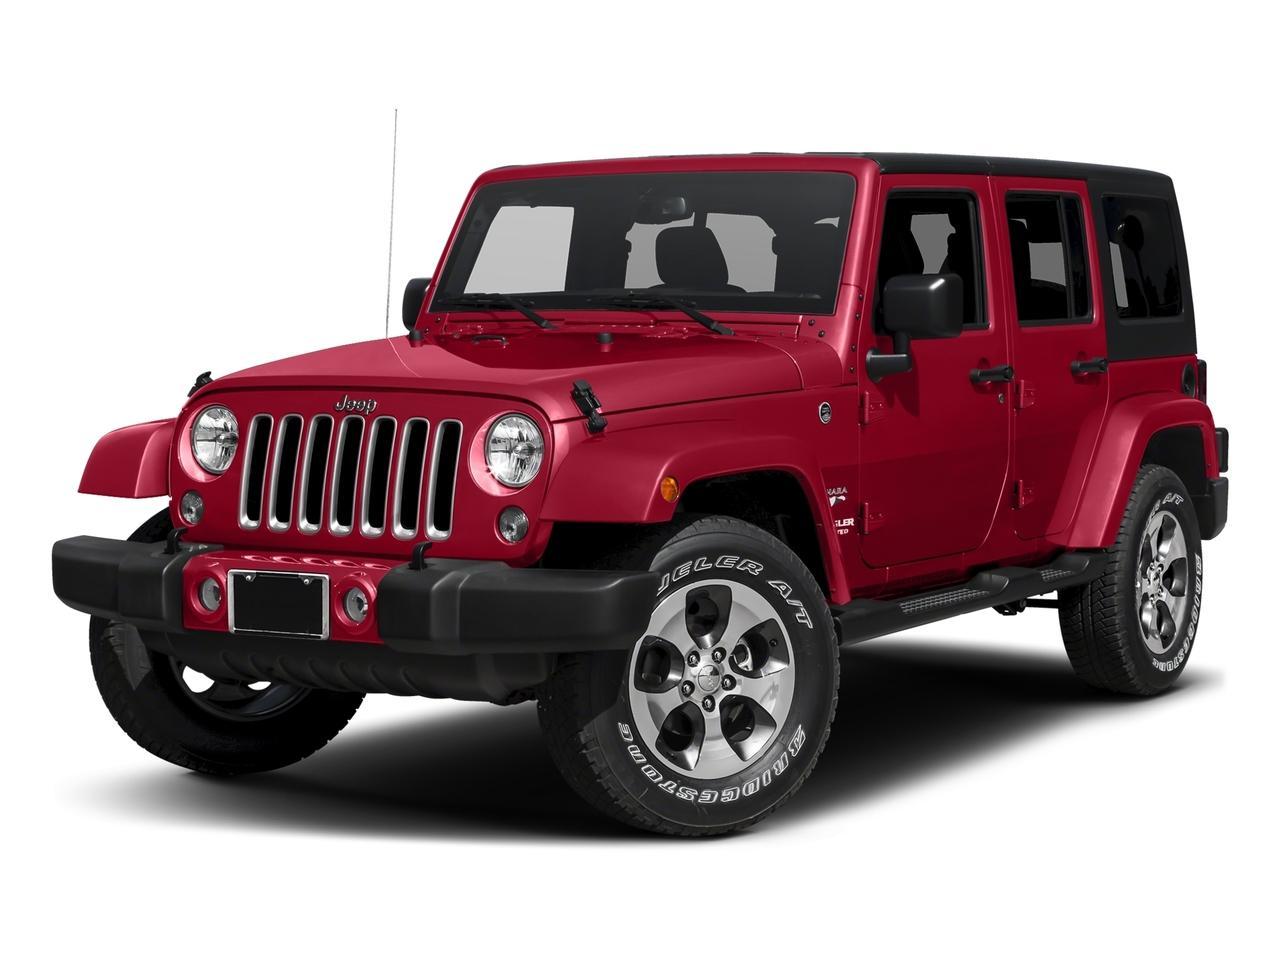 2016 Jeep Wrangler Unlimited Vehicle Photo in Prescott, AZ 86305